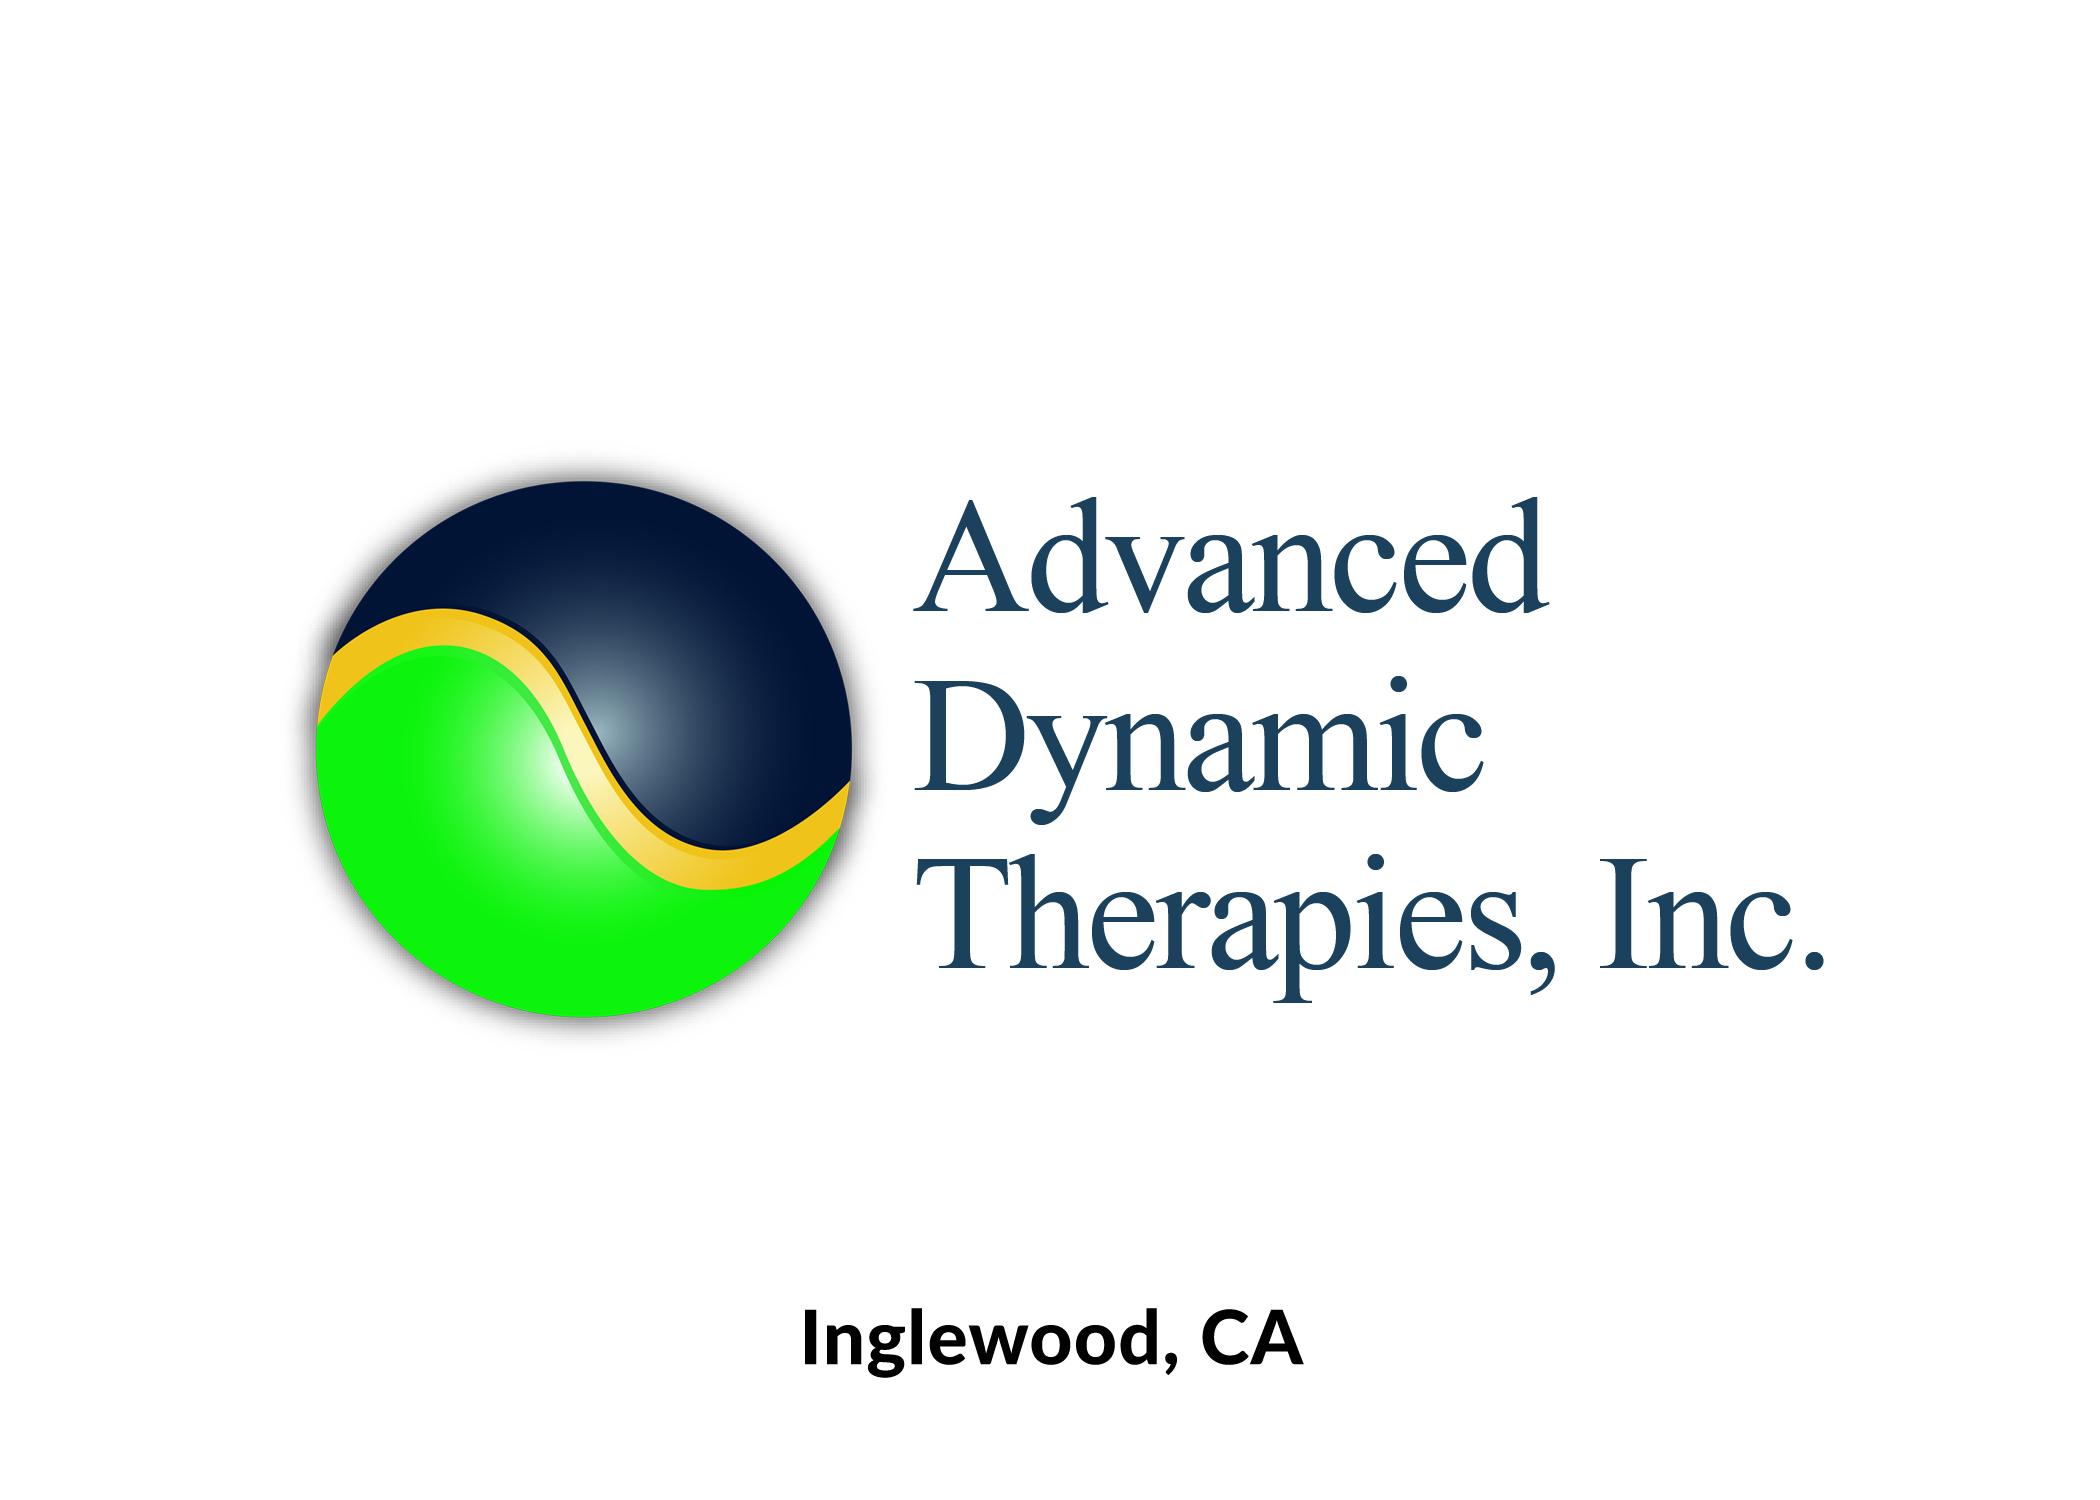 AdvancedDynamic_allcore_logo.jpg